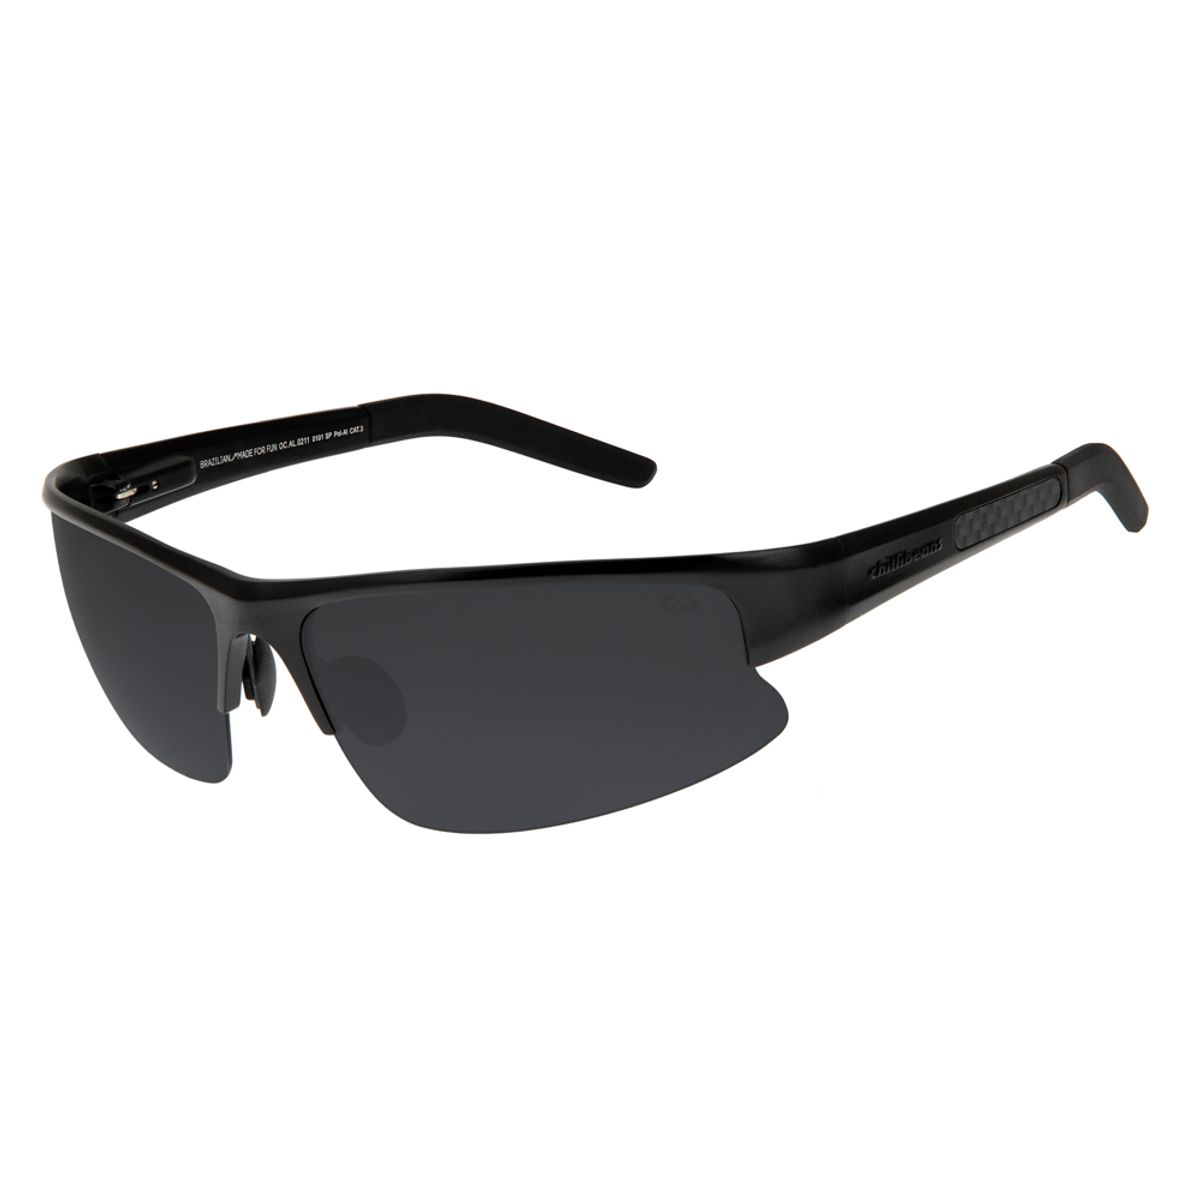 8451392b7 Óculos de Sol Chilli Beans Esportivo Masculino Polarizado Preto 0211 -  OC.AL.0211.0101 M. REF: OC.AL.0211.0101. OC.